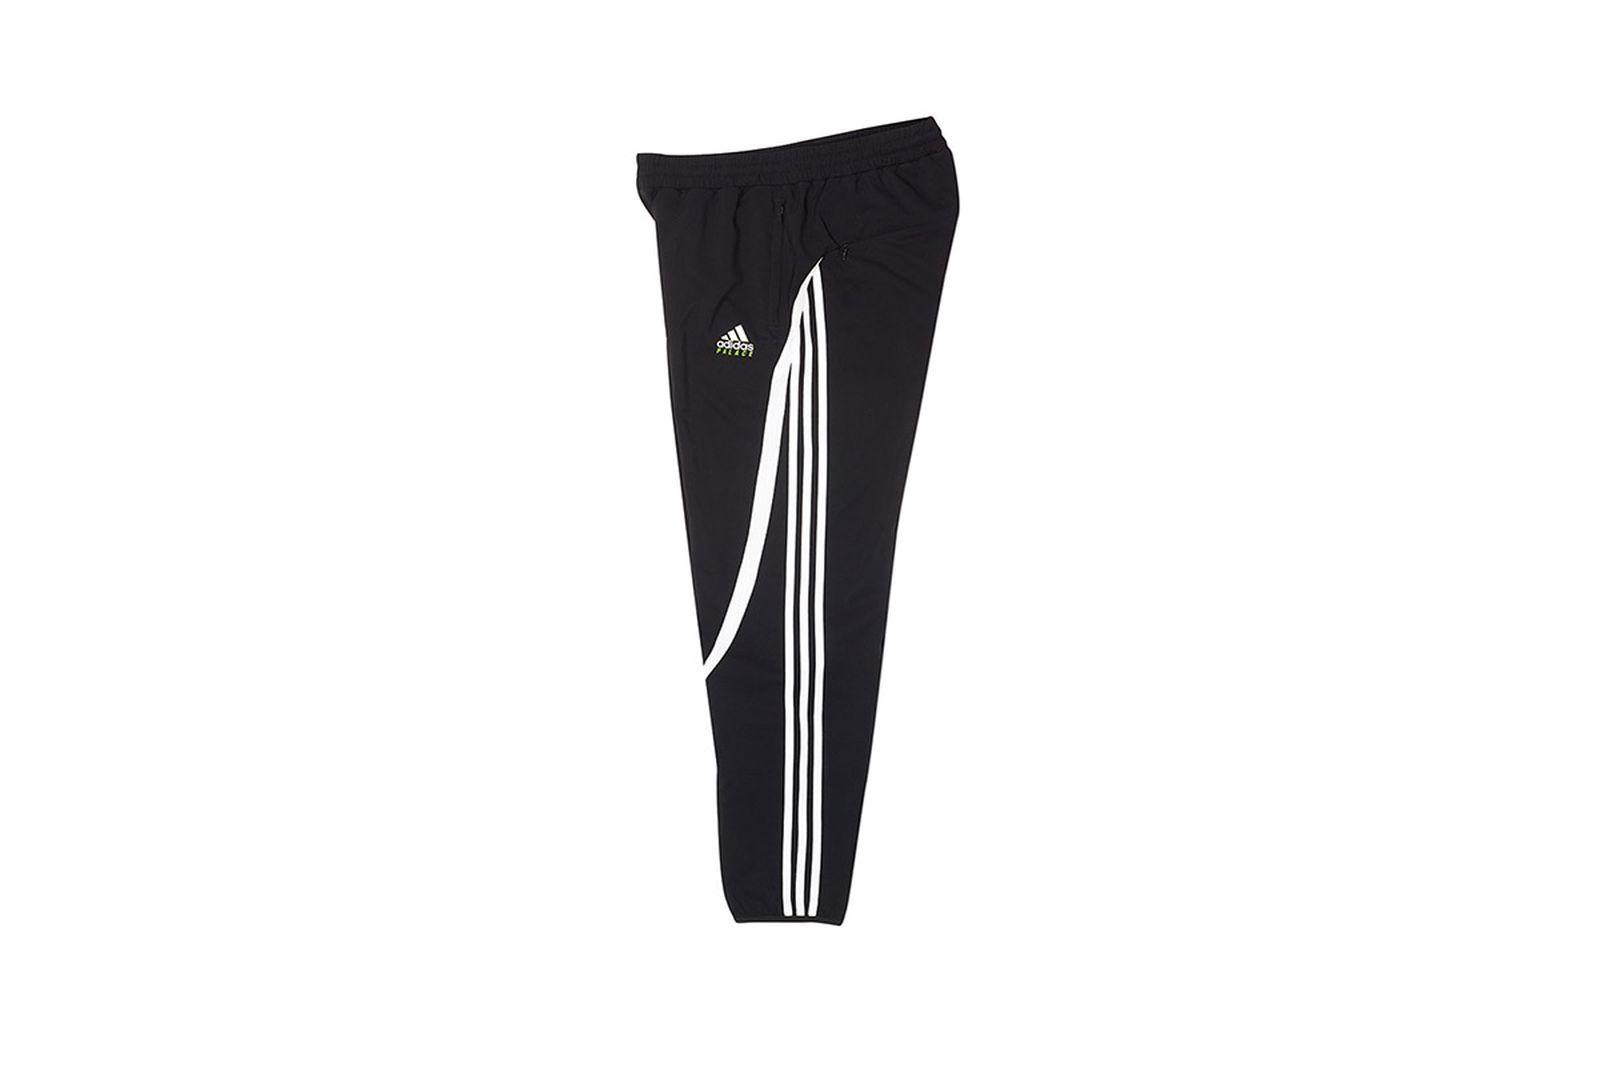 Palace-2019-Adidas-Juventus-Bottoms-Training-black-19625